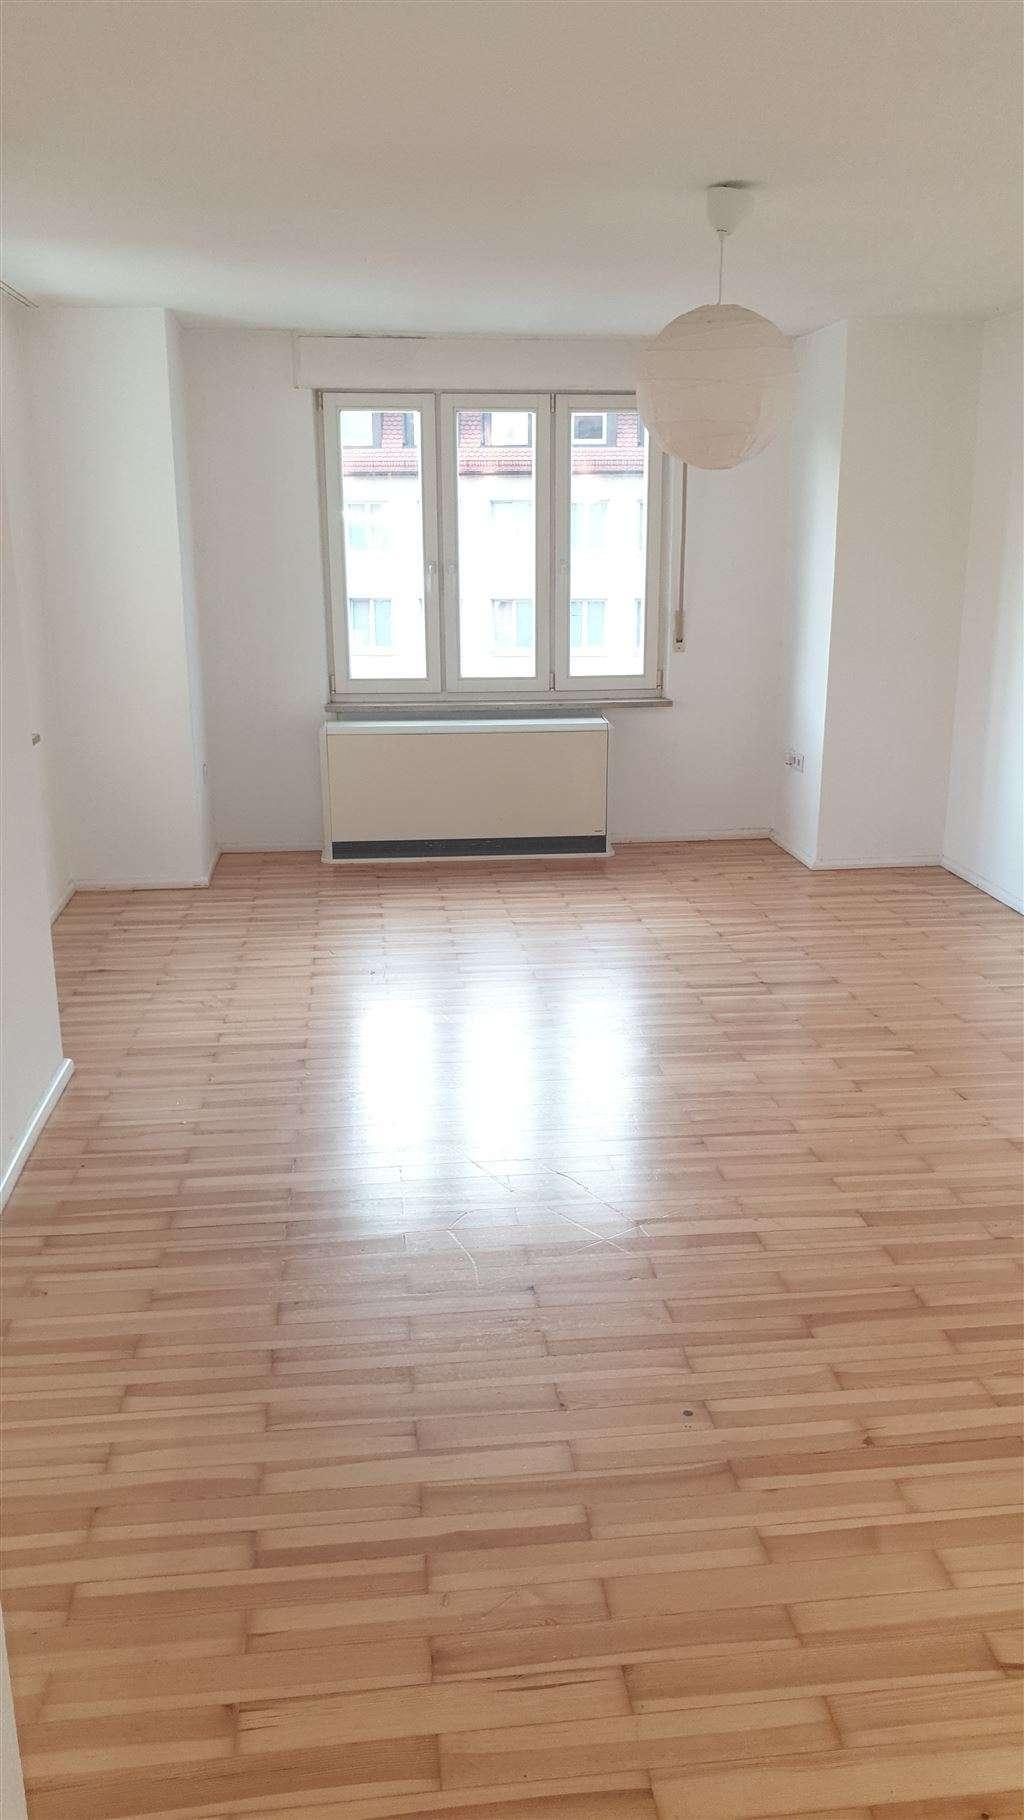 N-Sebald! Schöne 1-Zimmer-Wohnung in bester Lage!  in Altstadt, St. Sebald (Nürnberg)